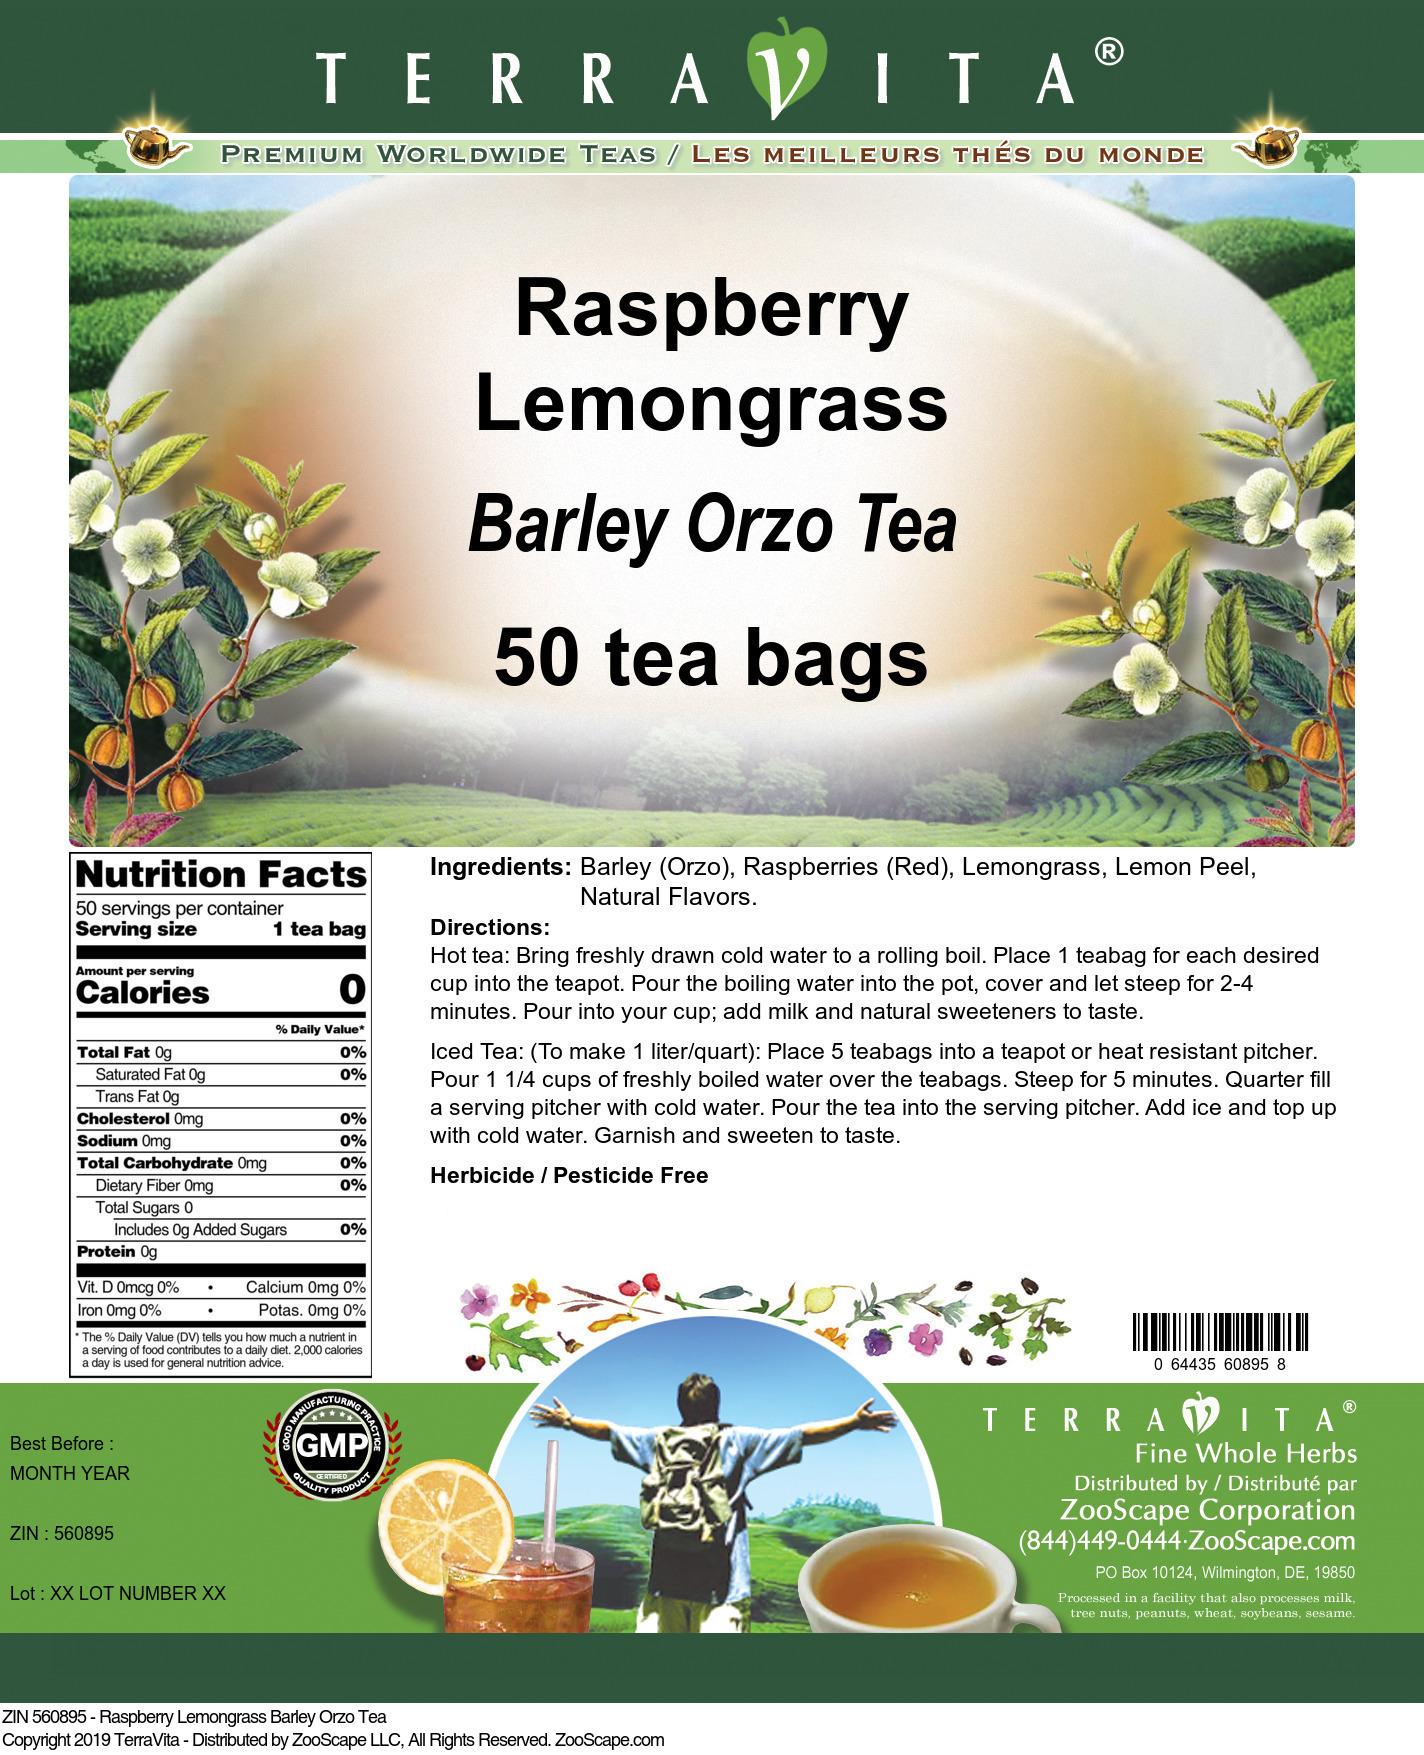 Raspberry Lemongrass Barley Orzo Tea